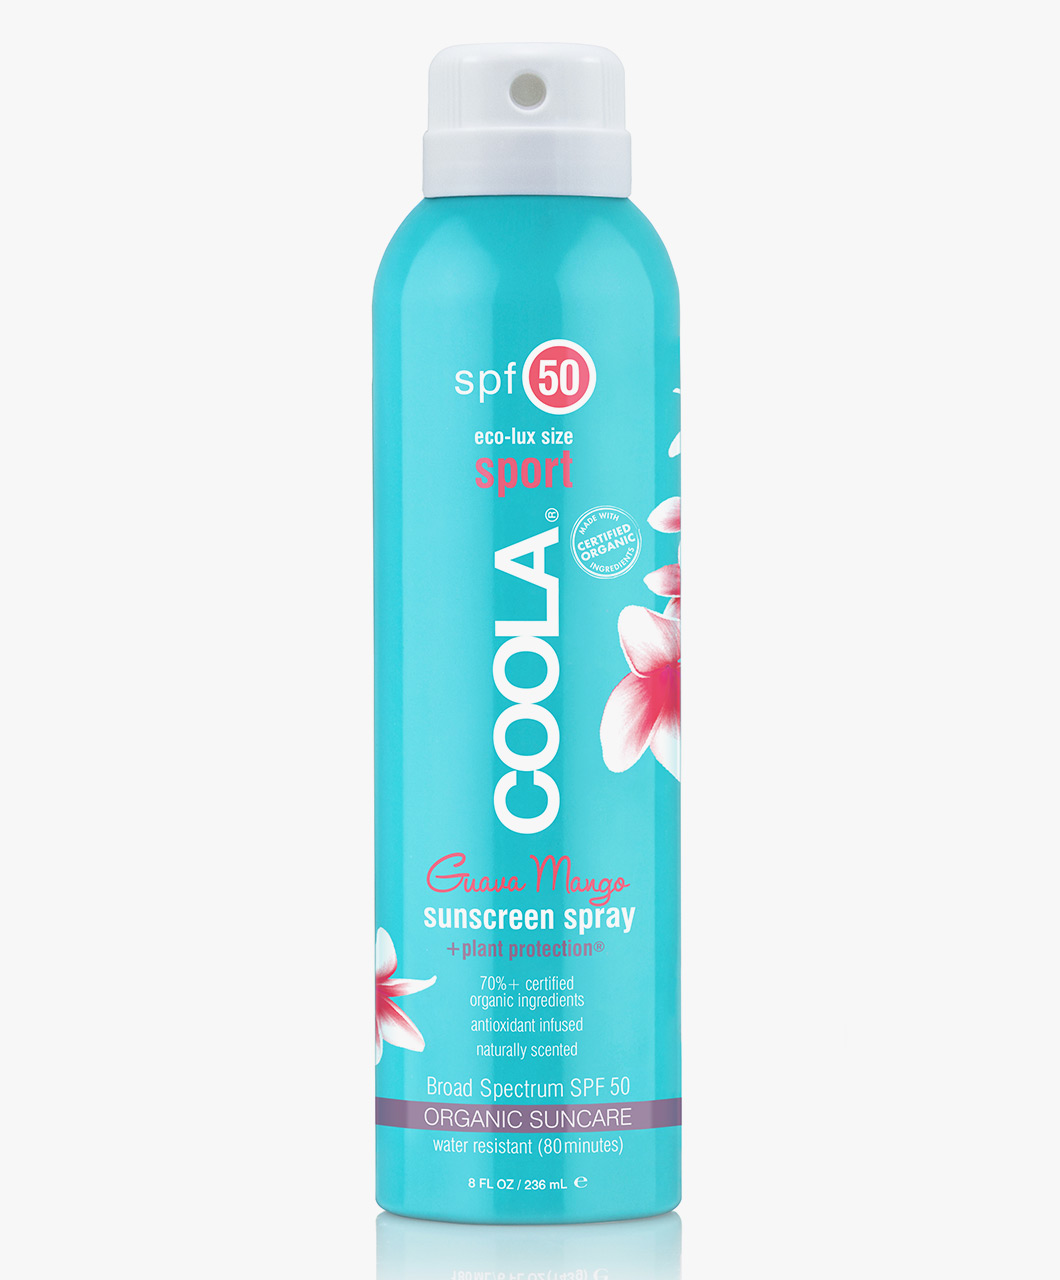 Afbeelding van Coola Body Sunscreen Spray SPF 50 Guava Mango 236ml